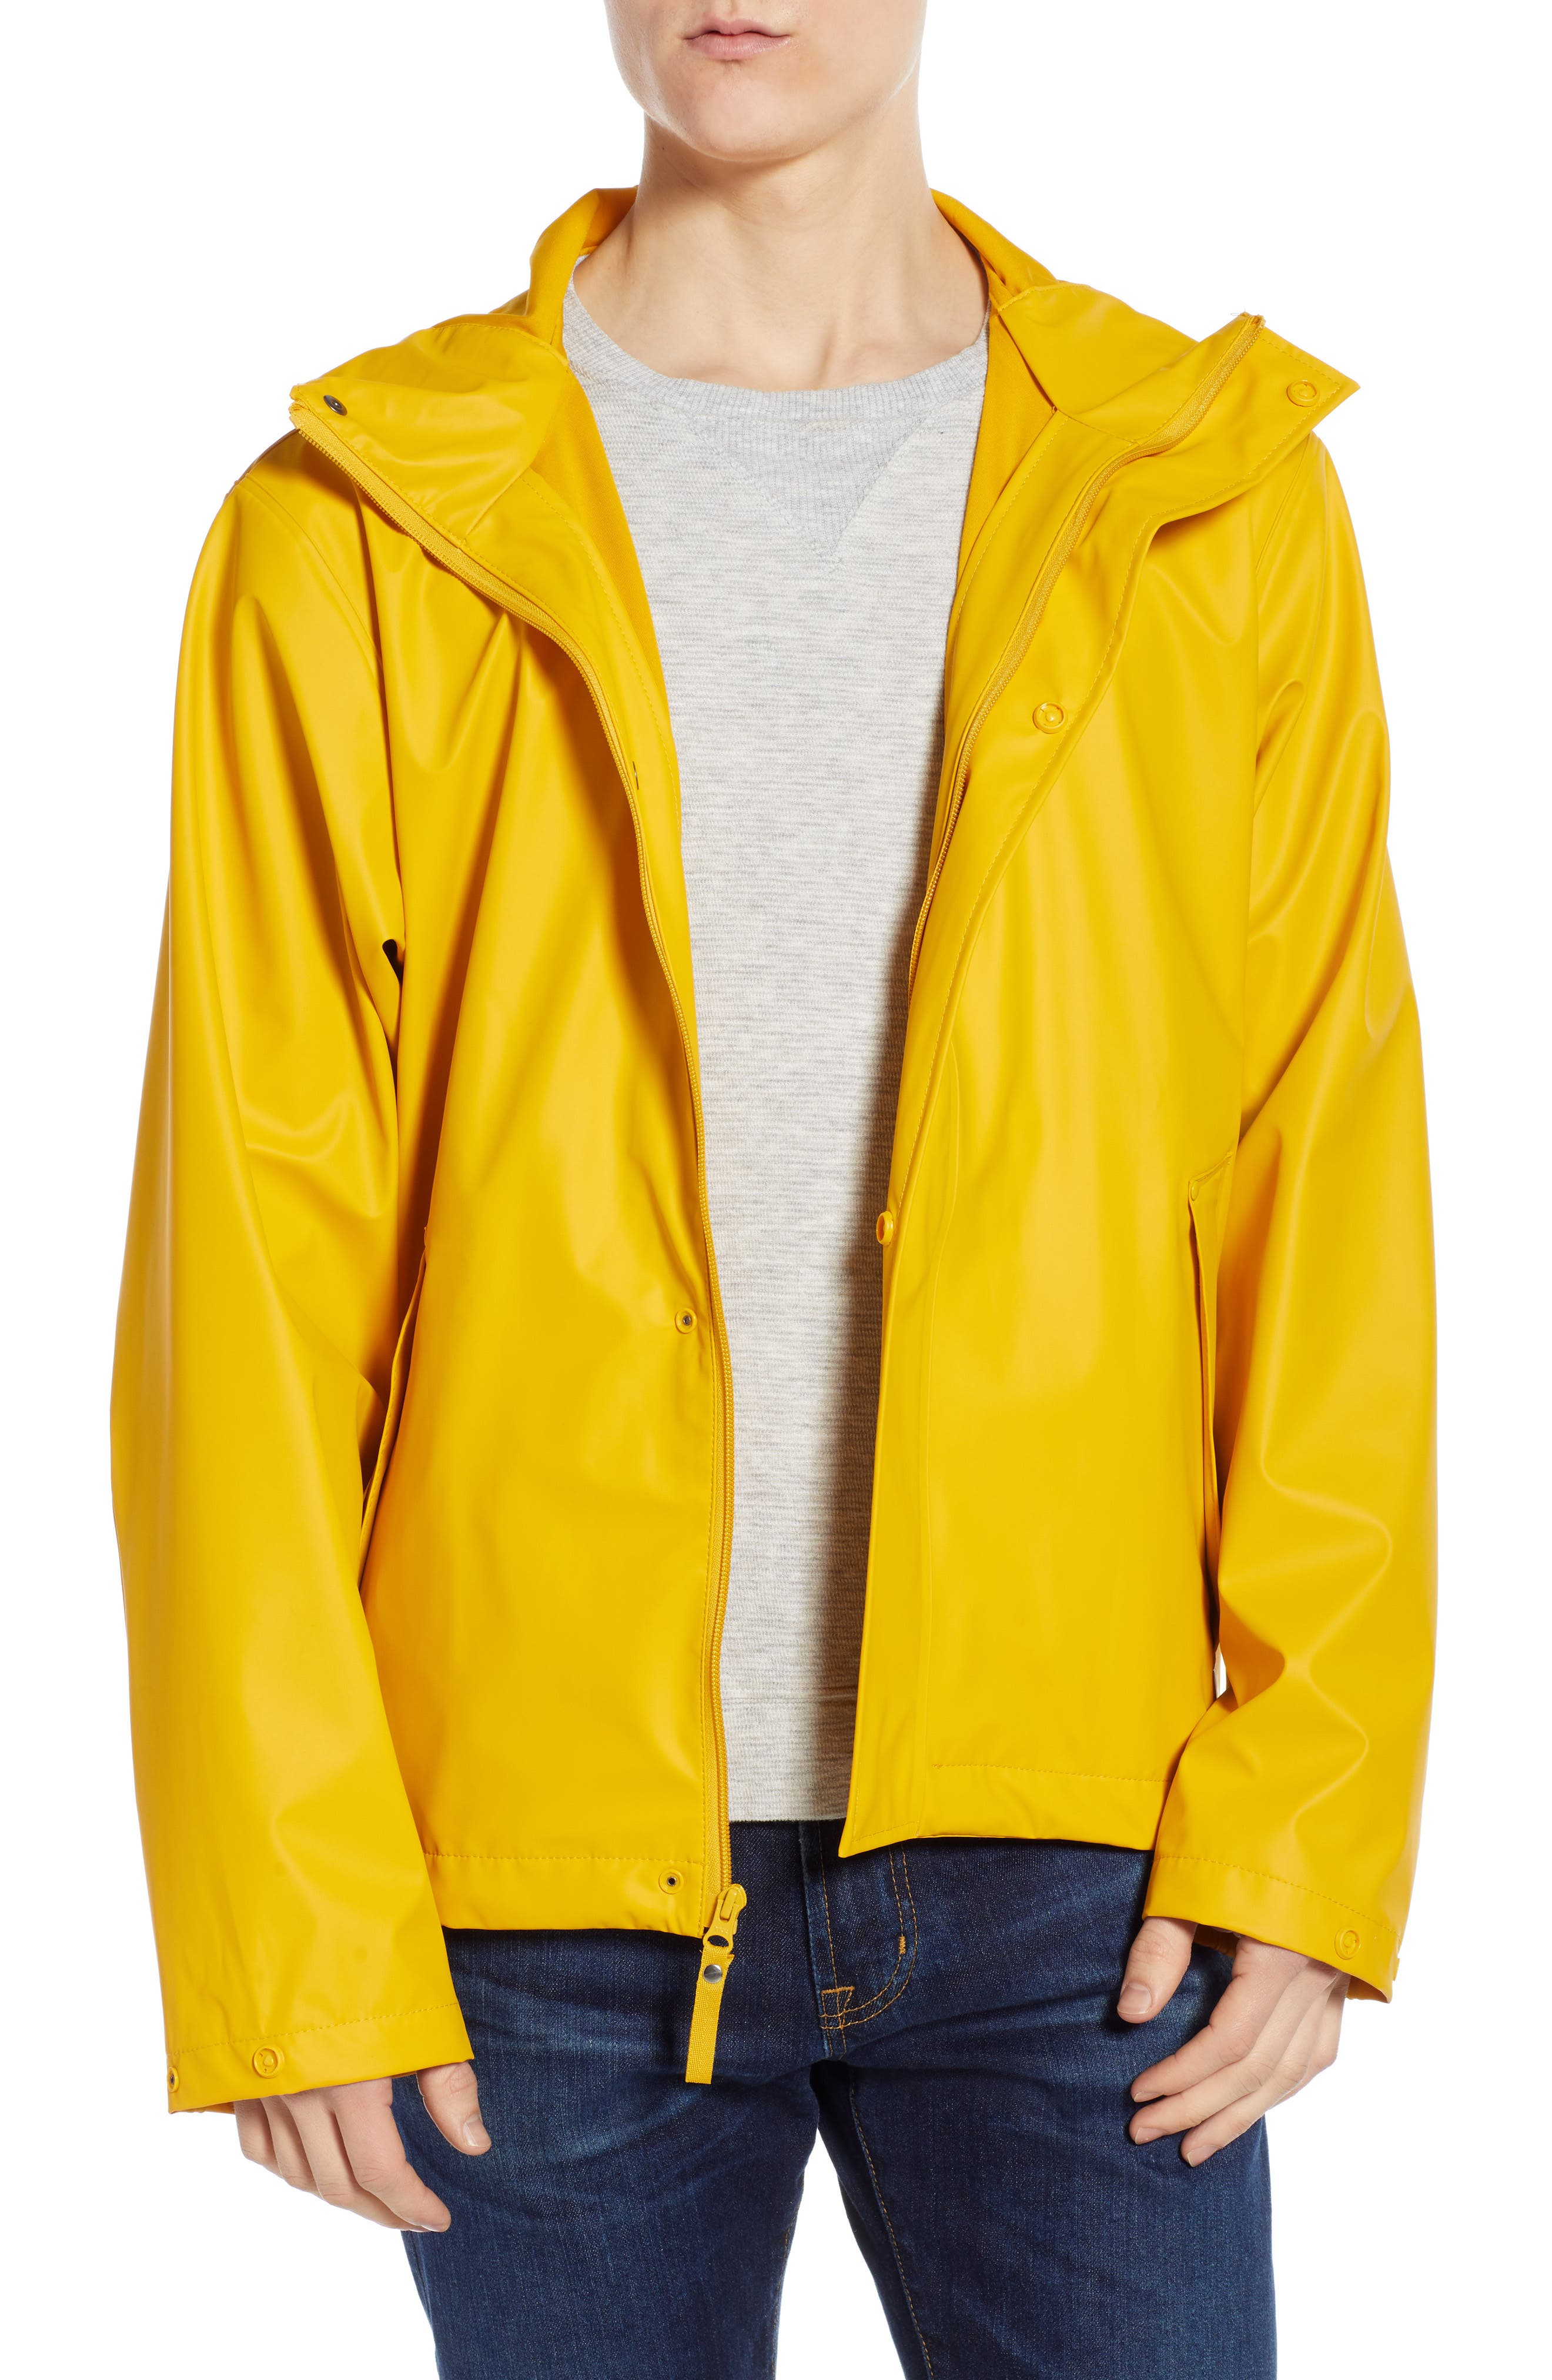 Moss Waterproof Raincoat